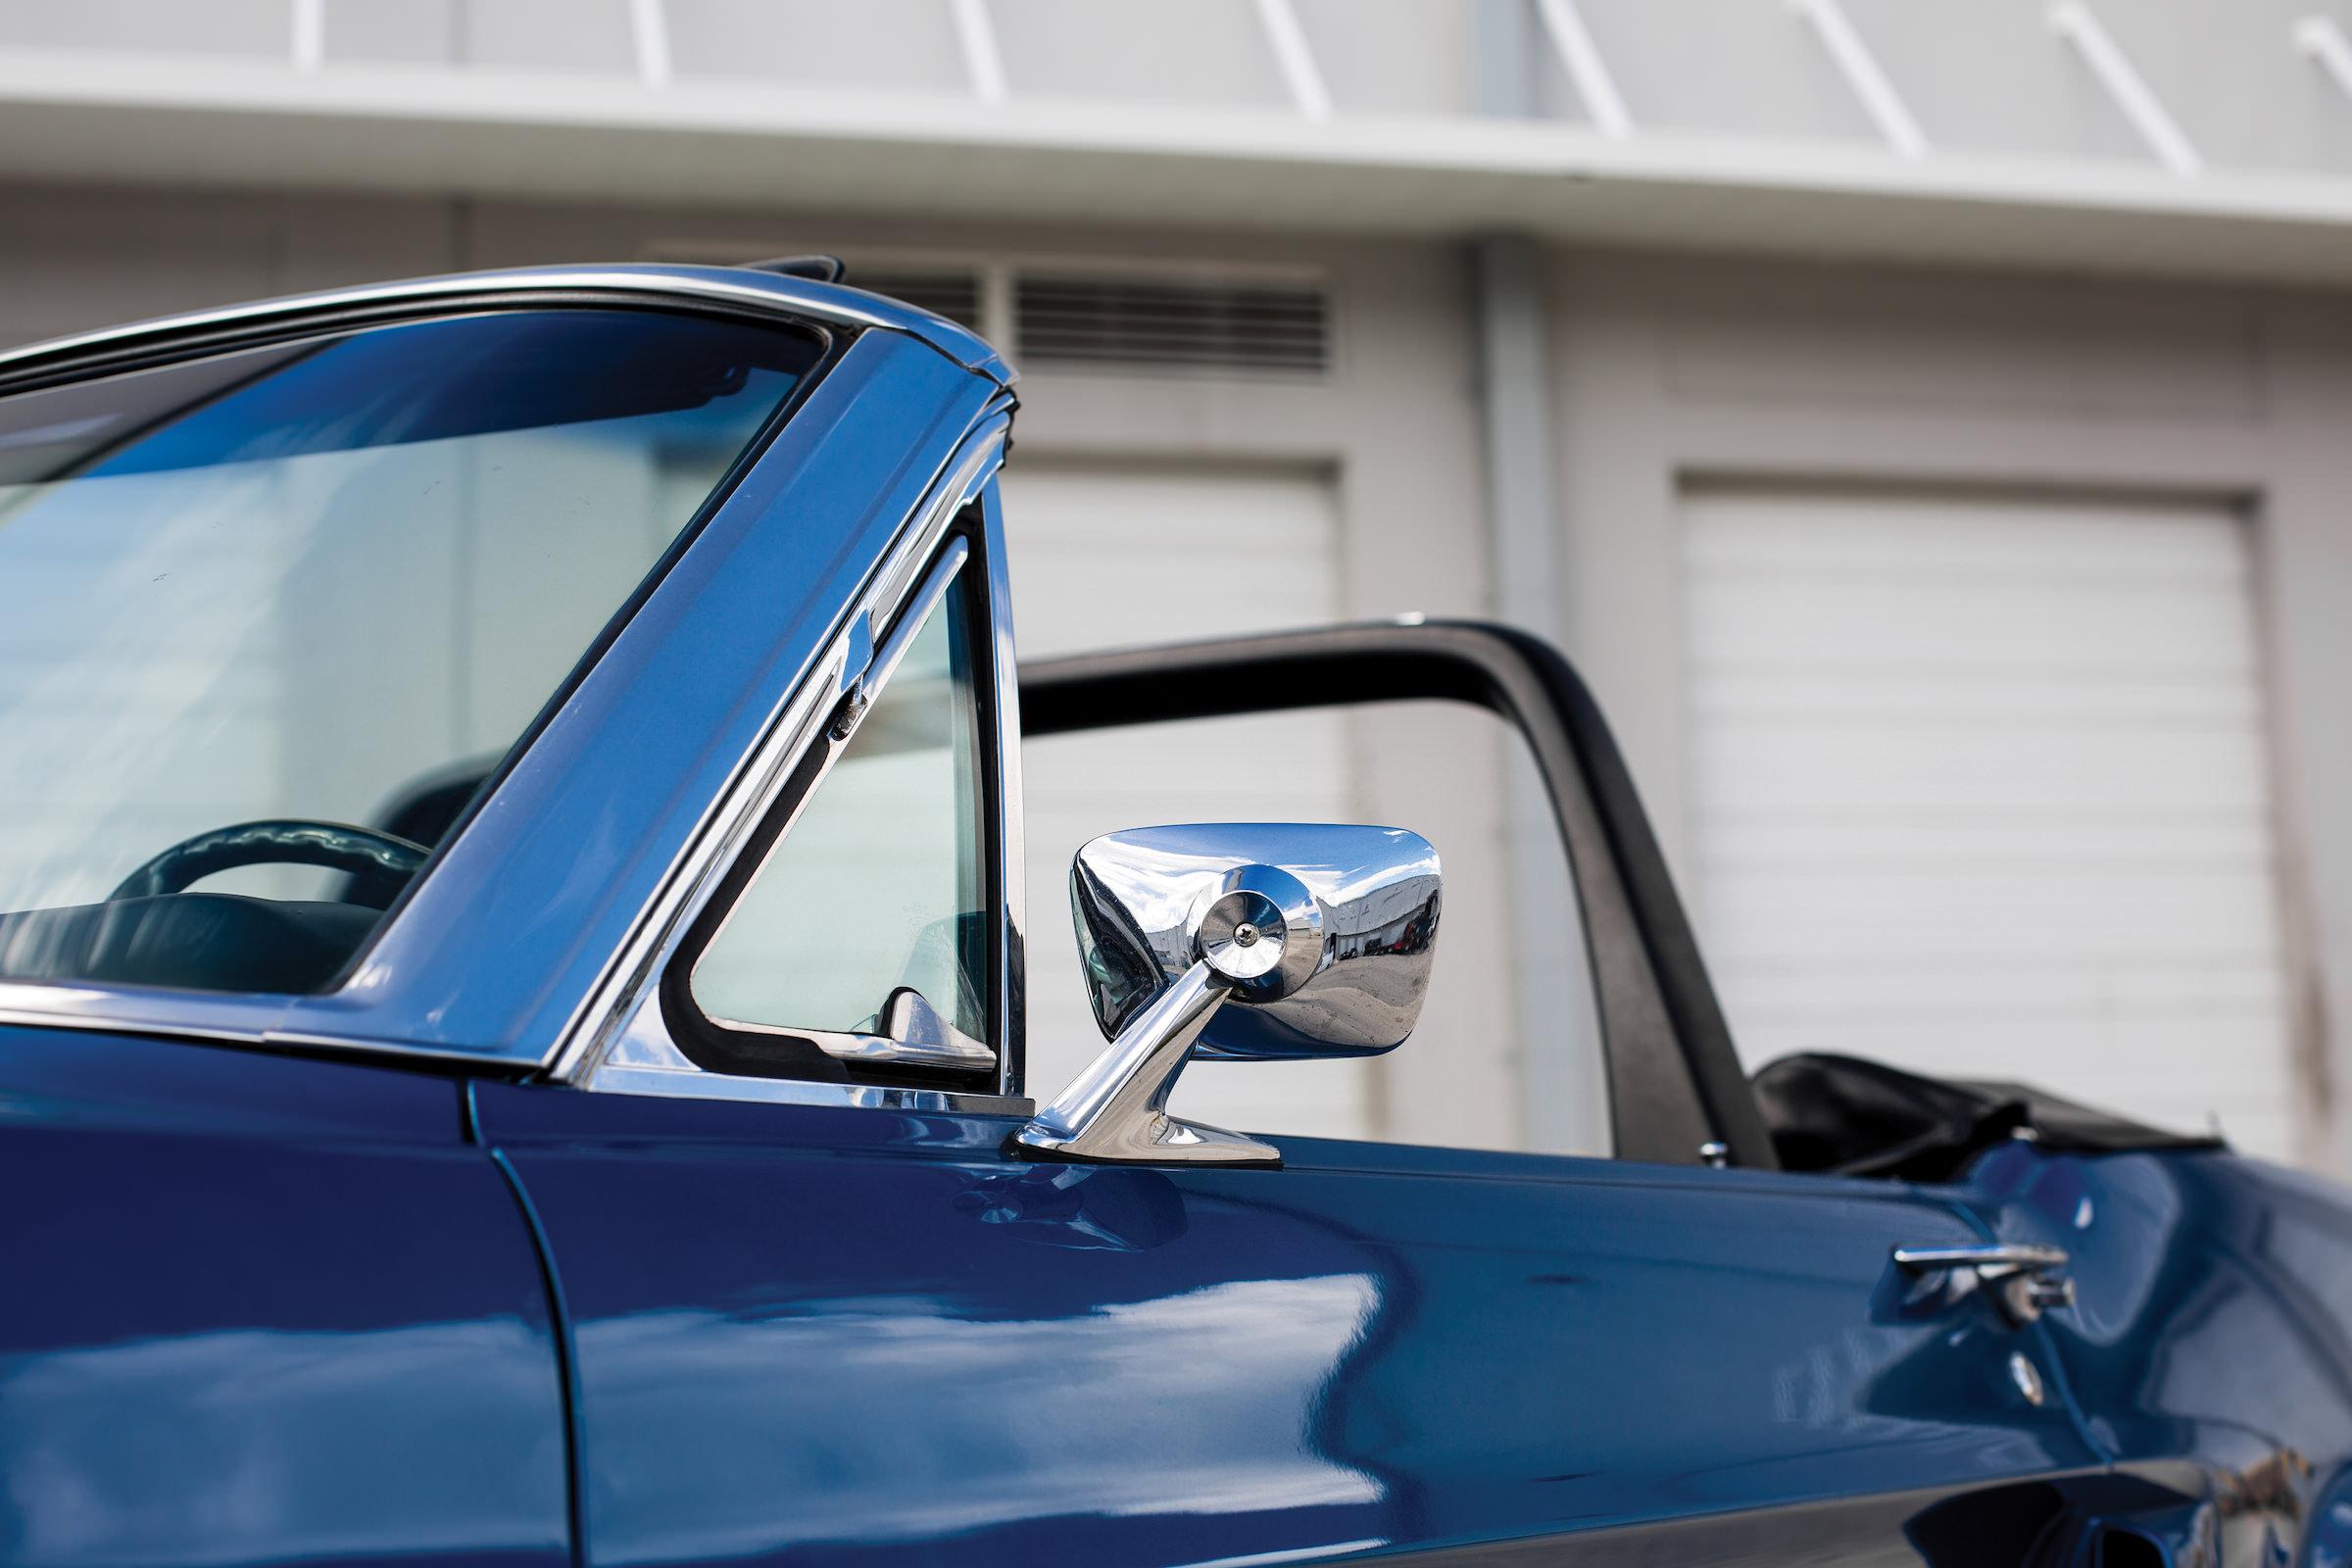 1 of 404  an original 1968 shelby gt350 mustang convertible